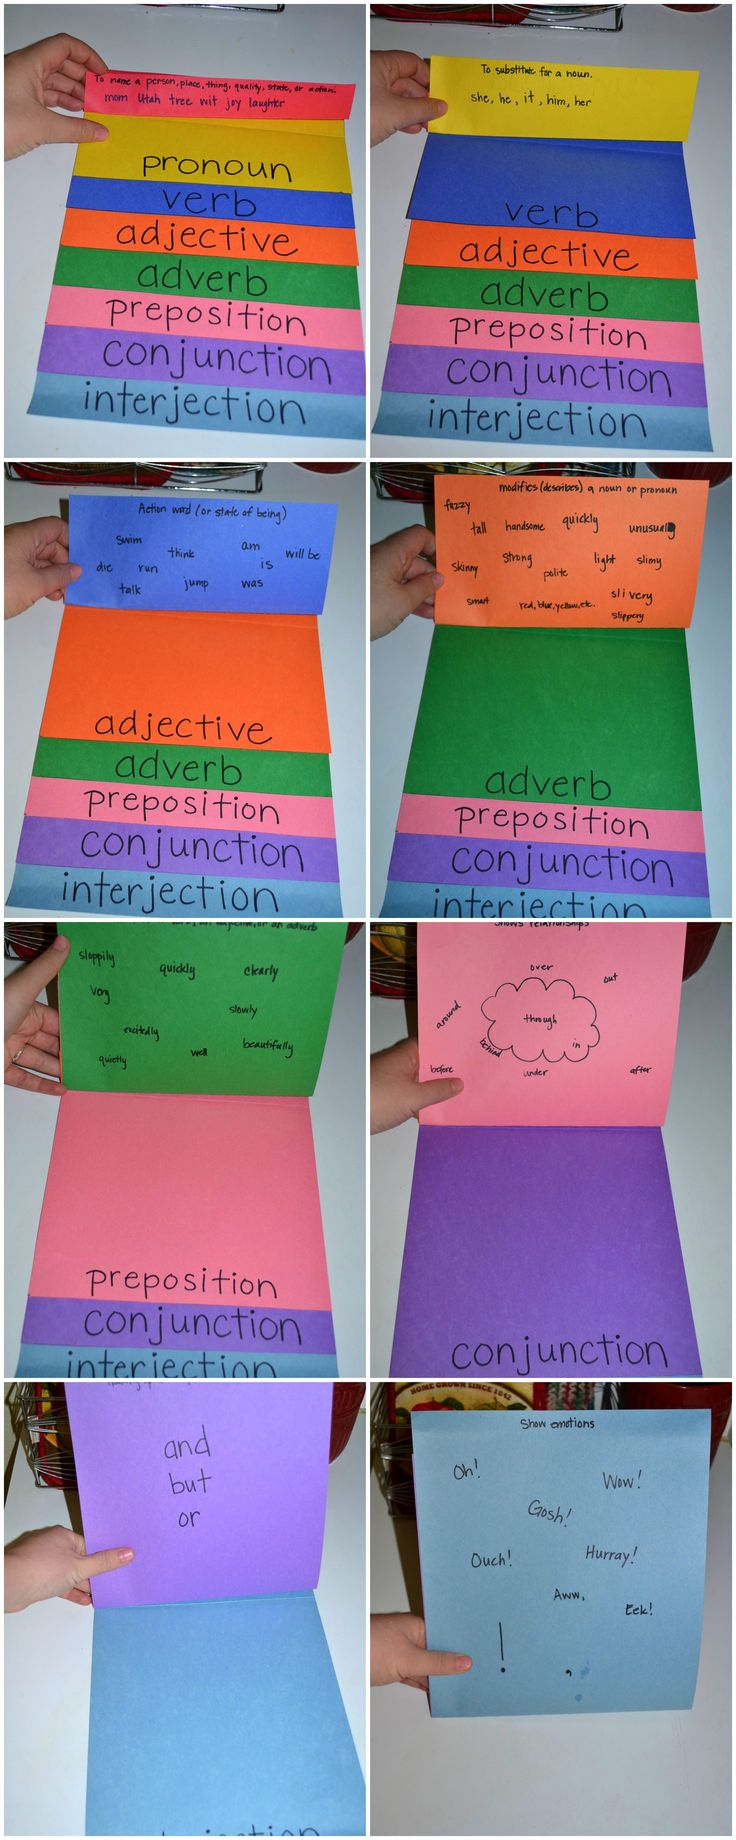 128 best images about Grammar on Pinterest   First grade, Anchor ...